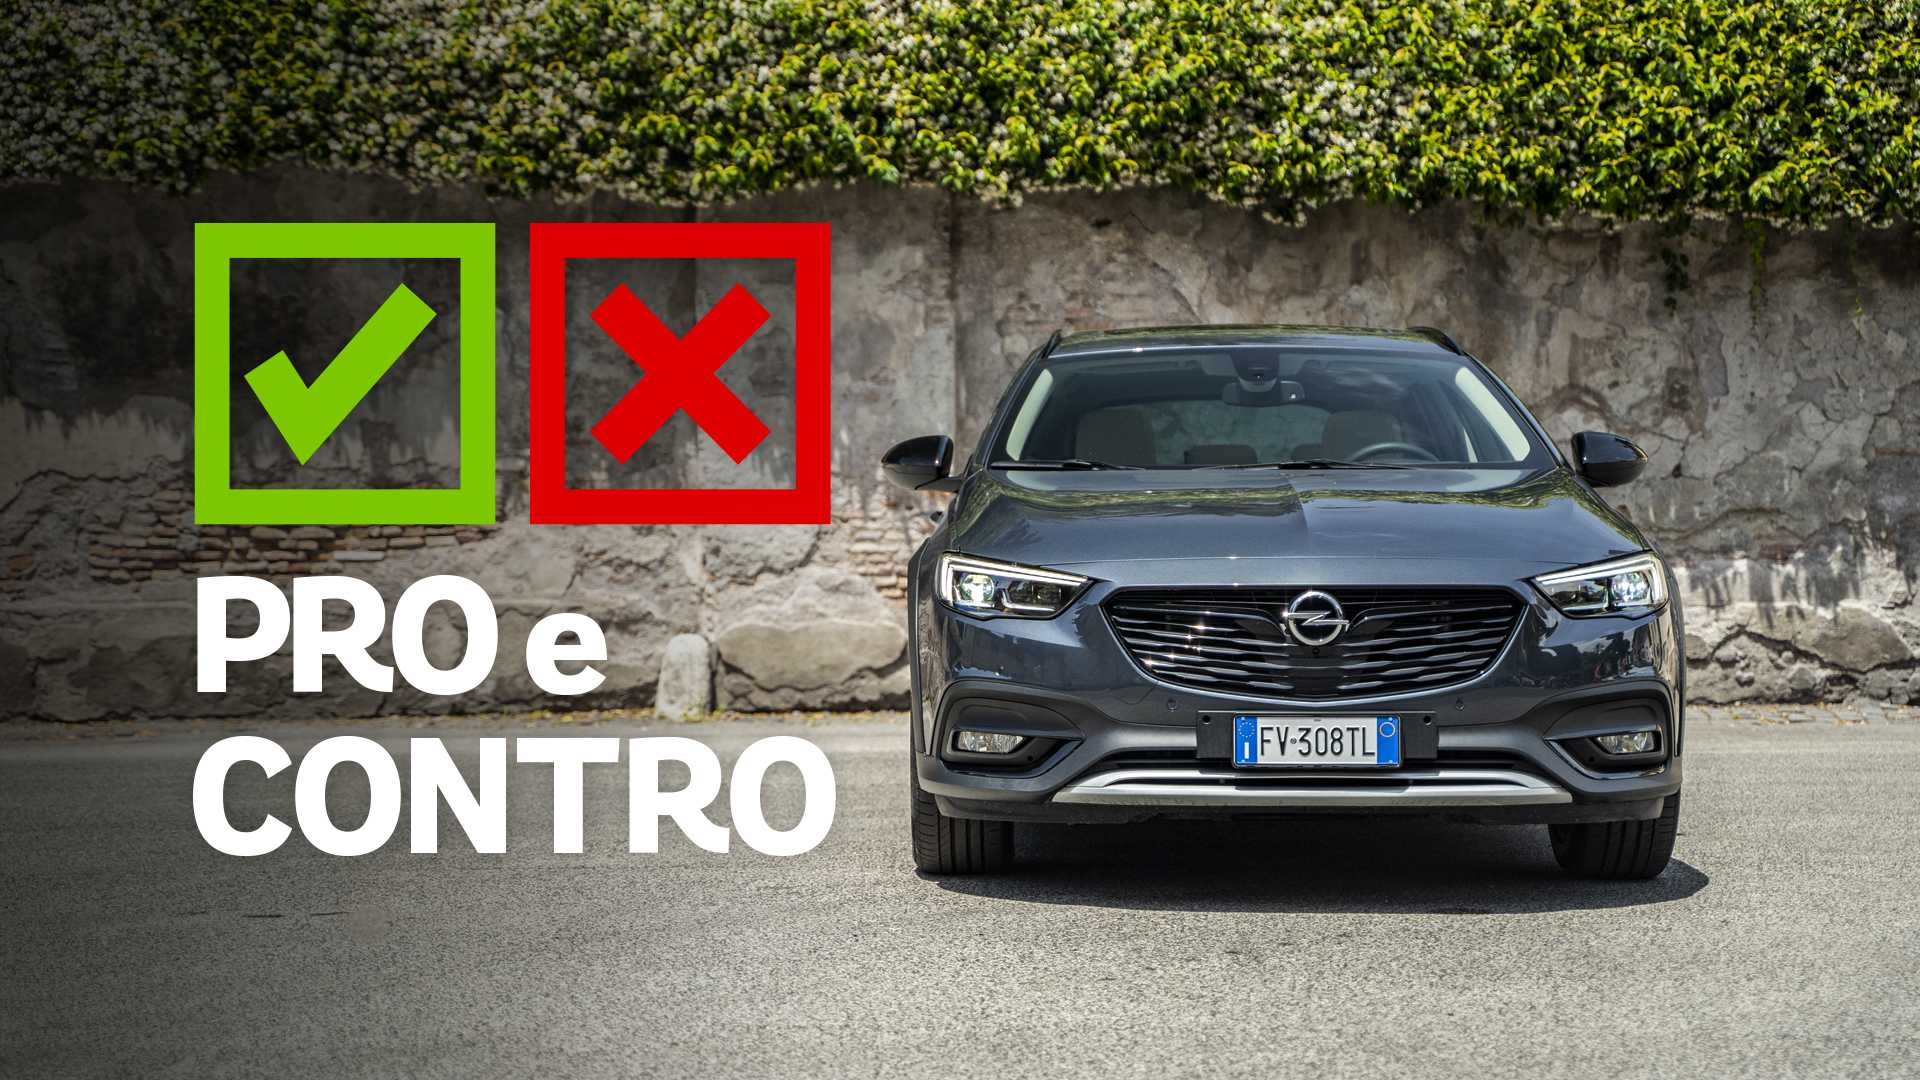 Opel Insignia 2.0 BiT Country Tourer, pro e contro